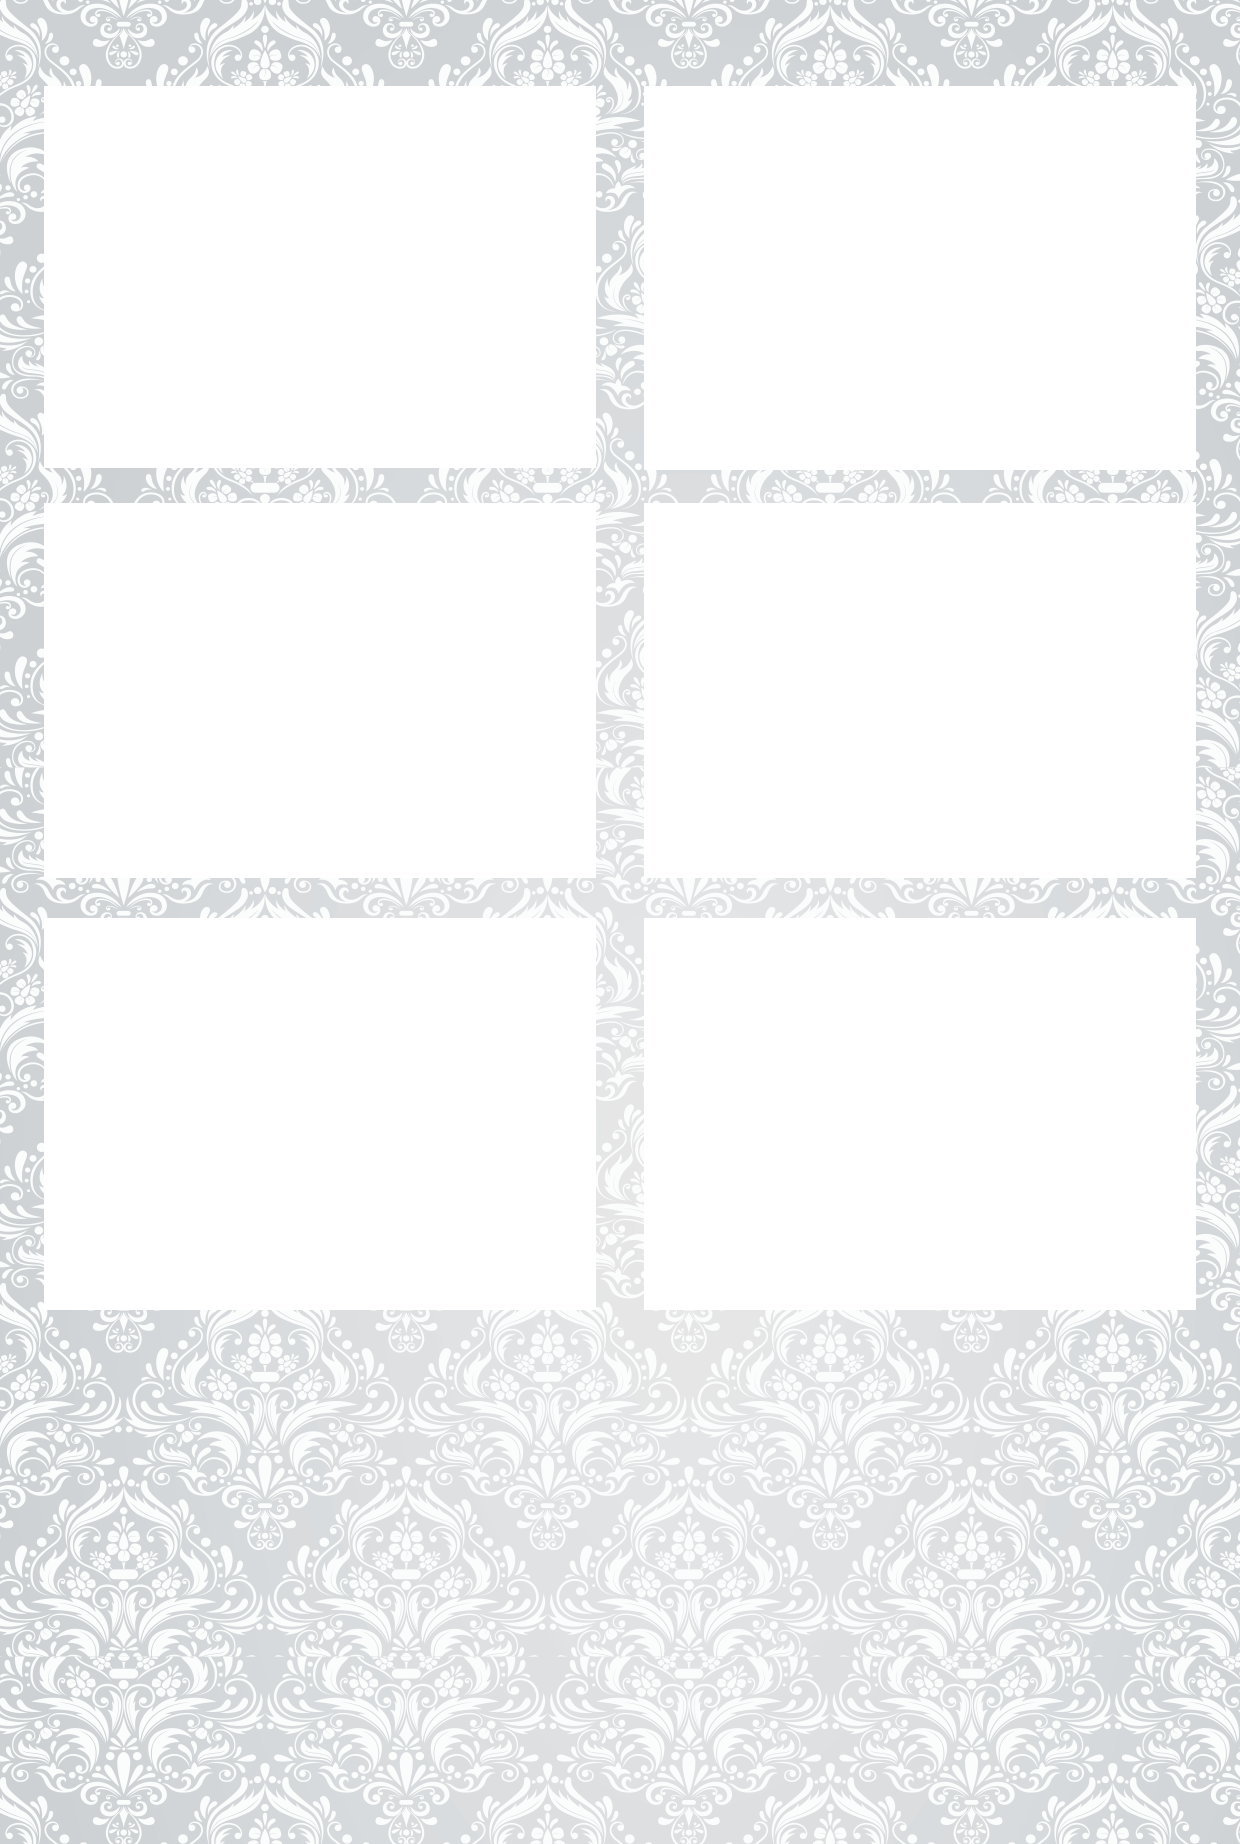 2. Grey Flowers